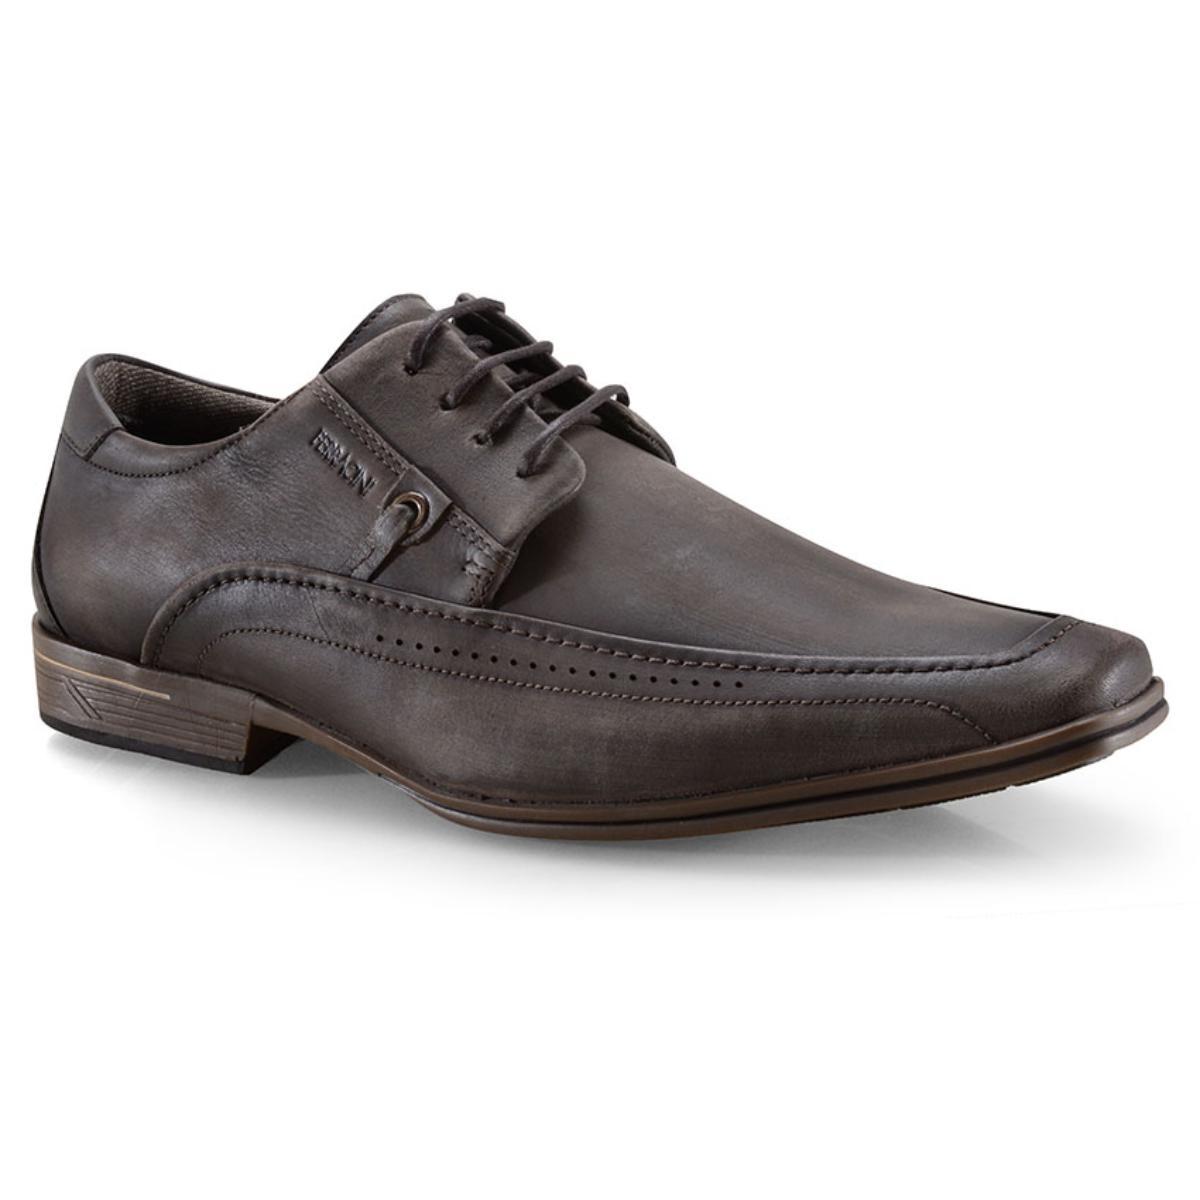 Sapato Masculino Ferracini 3041-281j Chocolate